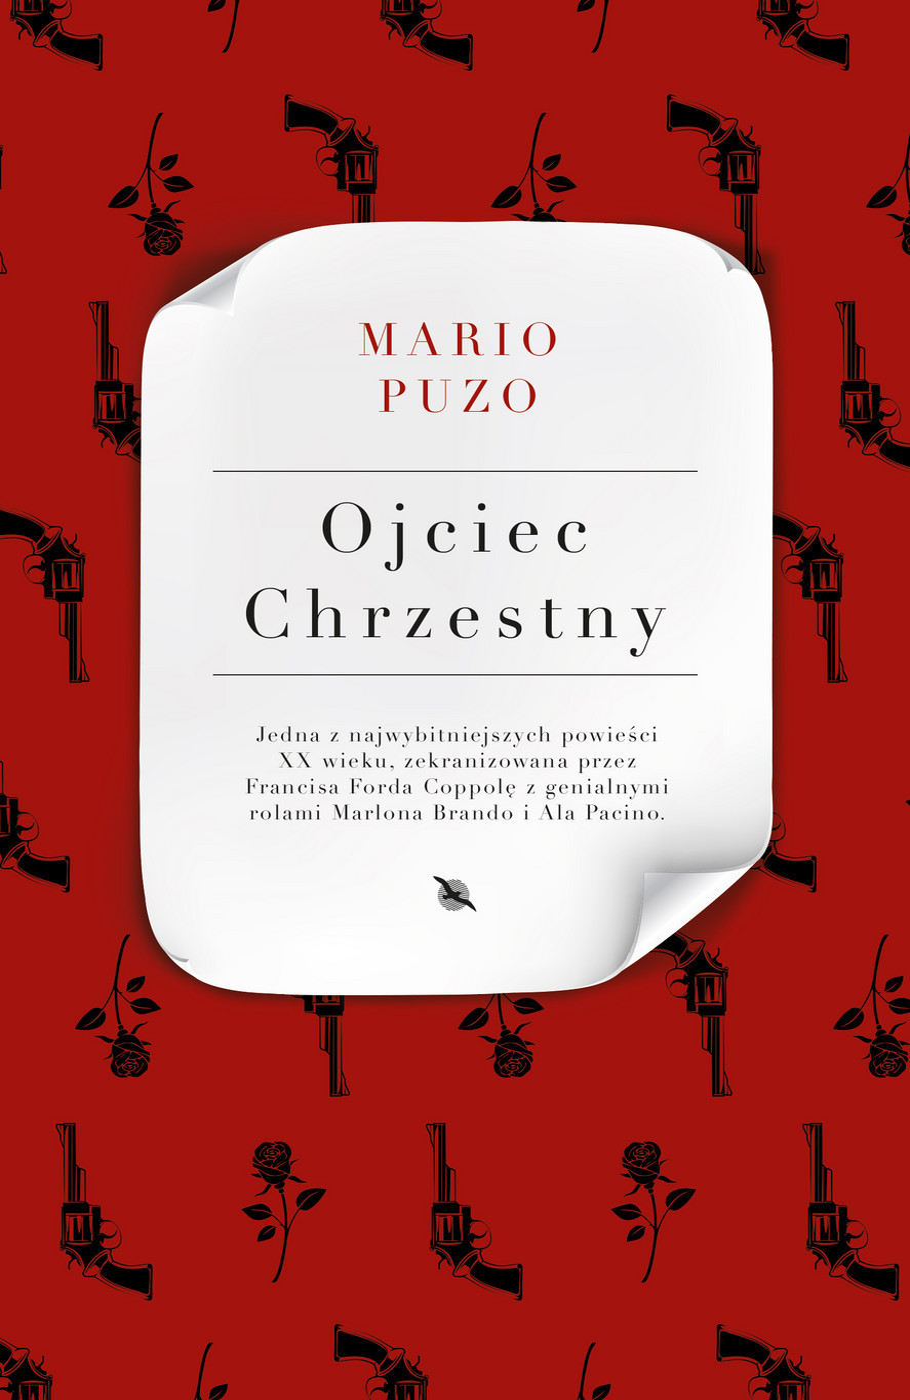 kryminał,kryminał,sensacja,thrillerebook, Ojciec,chrzestny,Mario Puzo,Ojciec chrzestny - Mario Puzo ebook,ściągnięcia,download pdf,Ojciec chrzestny - Mario Puzo,download